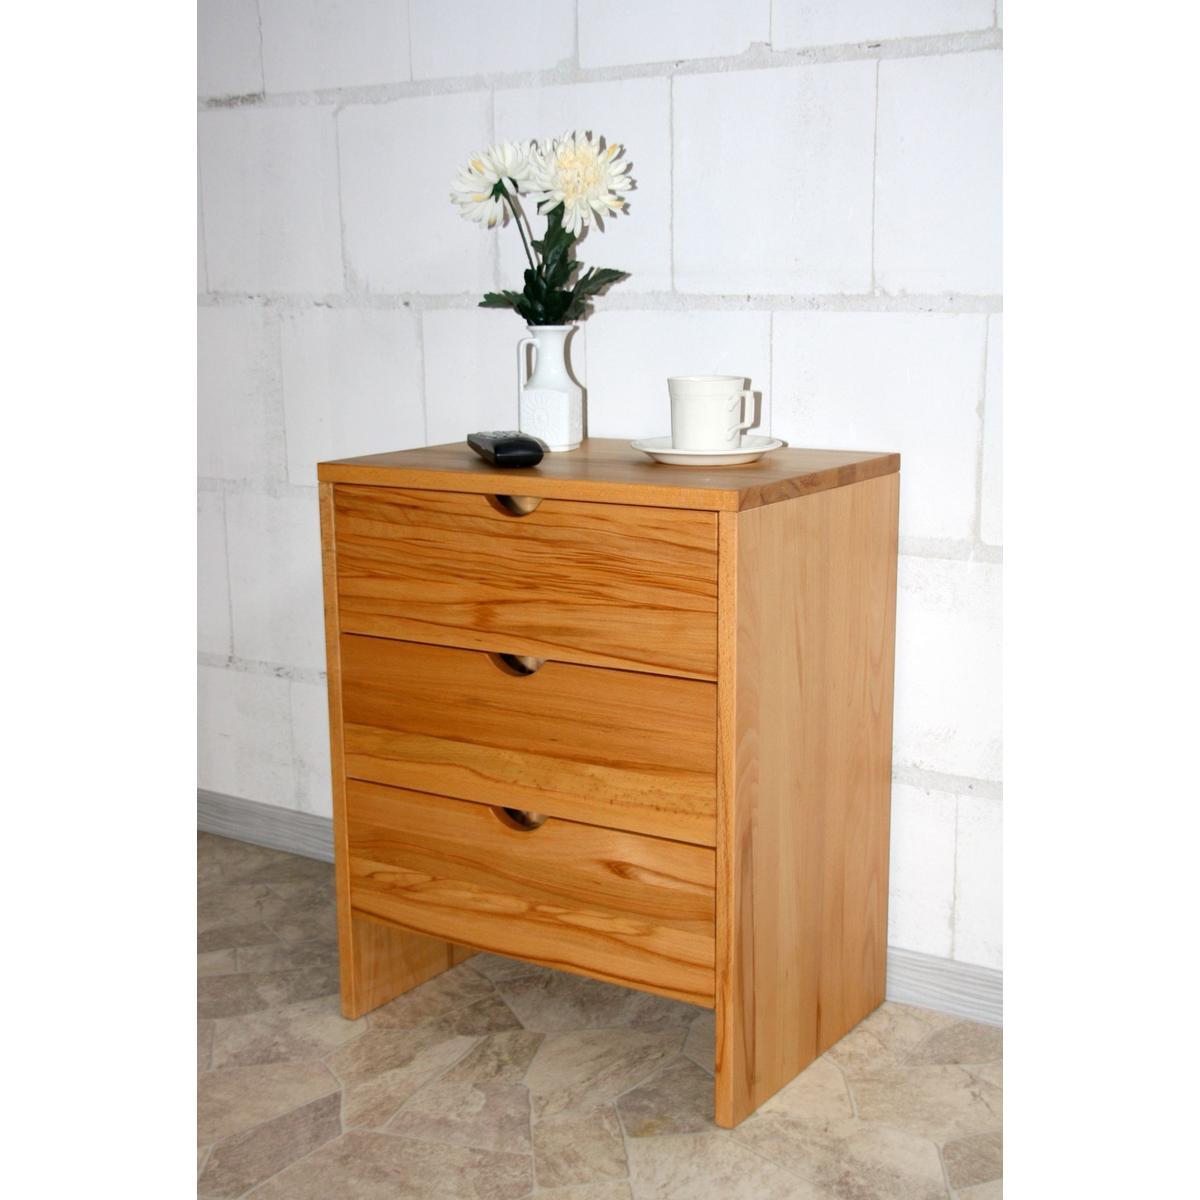 kommode schmal take it kernbuche massiv ge lt gewachst. Black Bedroom Furniture Sets. Home Design Ideas